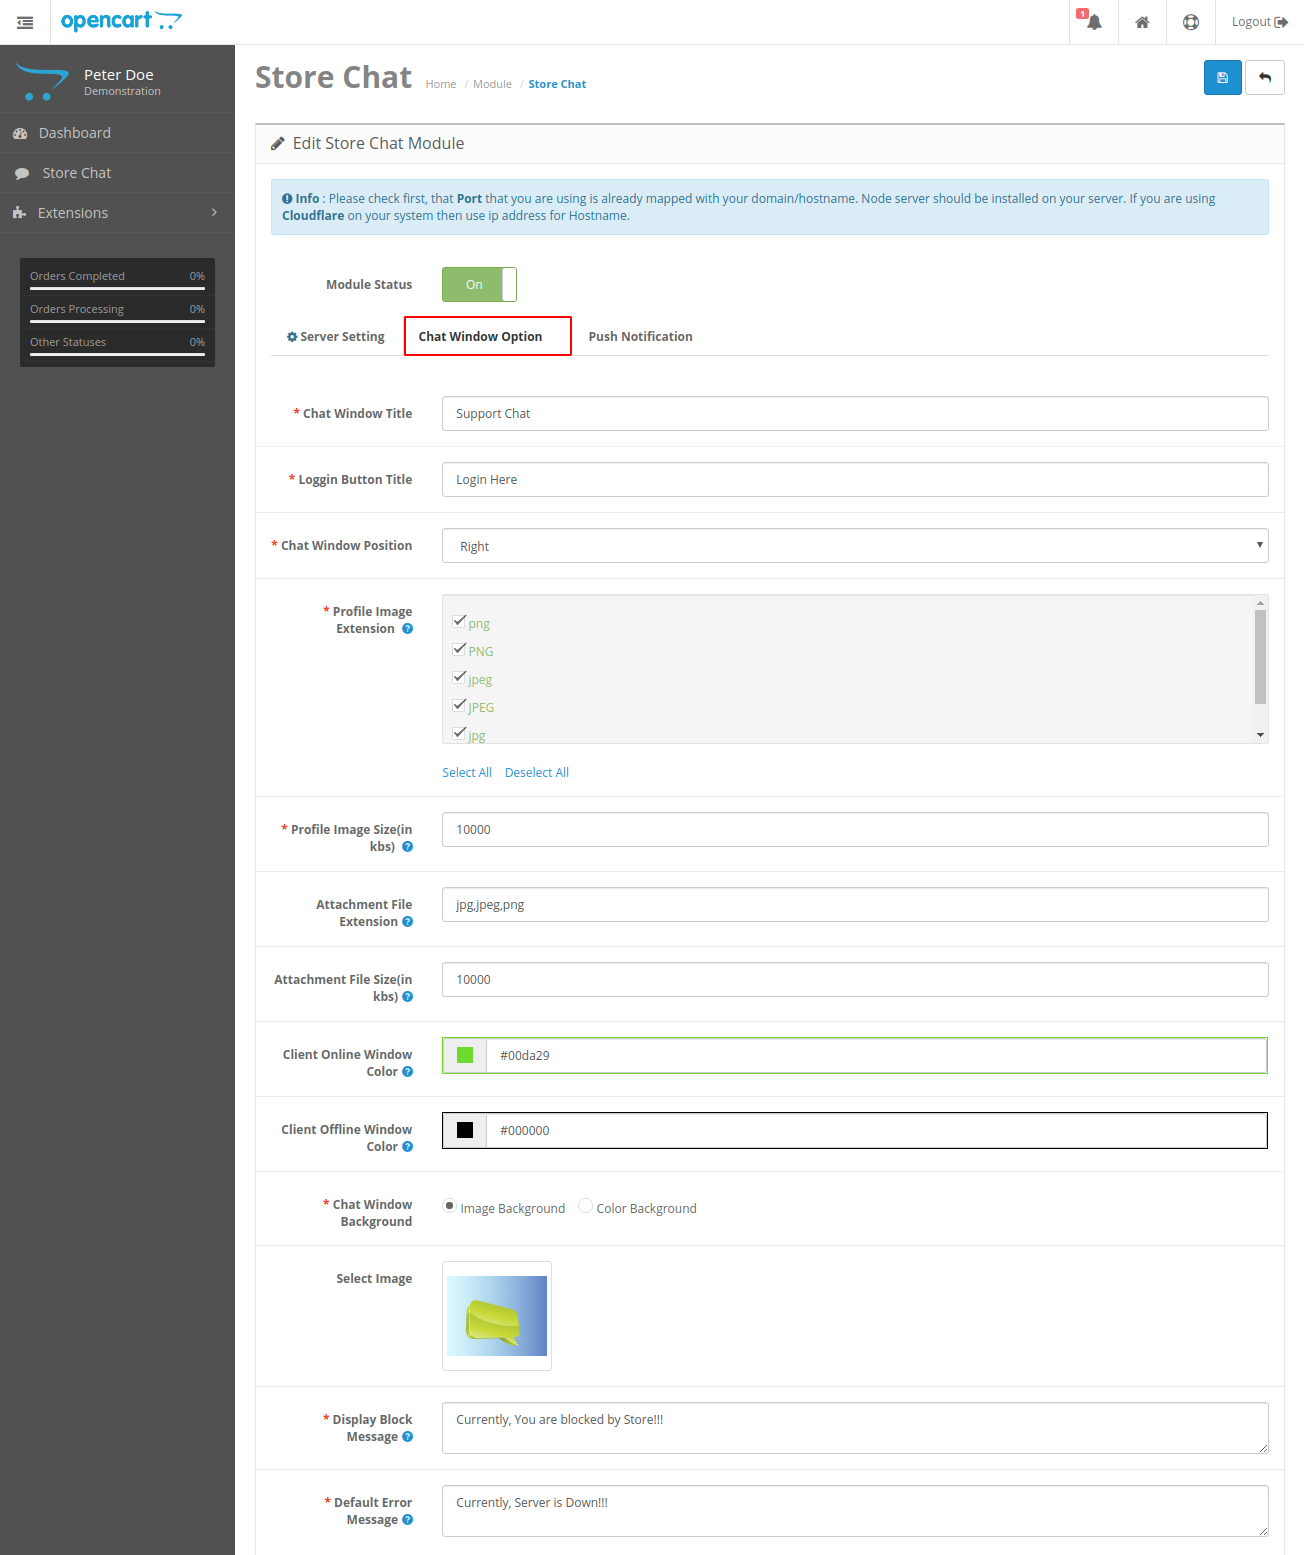 webkul-opencart-admin-buyer-chat-status-enabled-server-setting-2